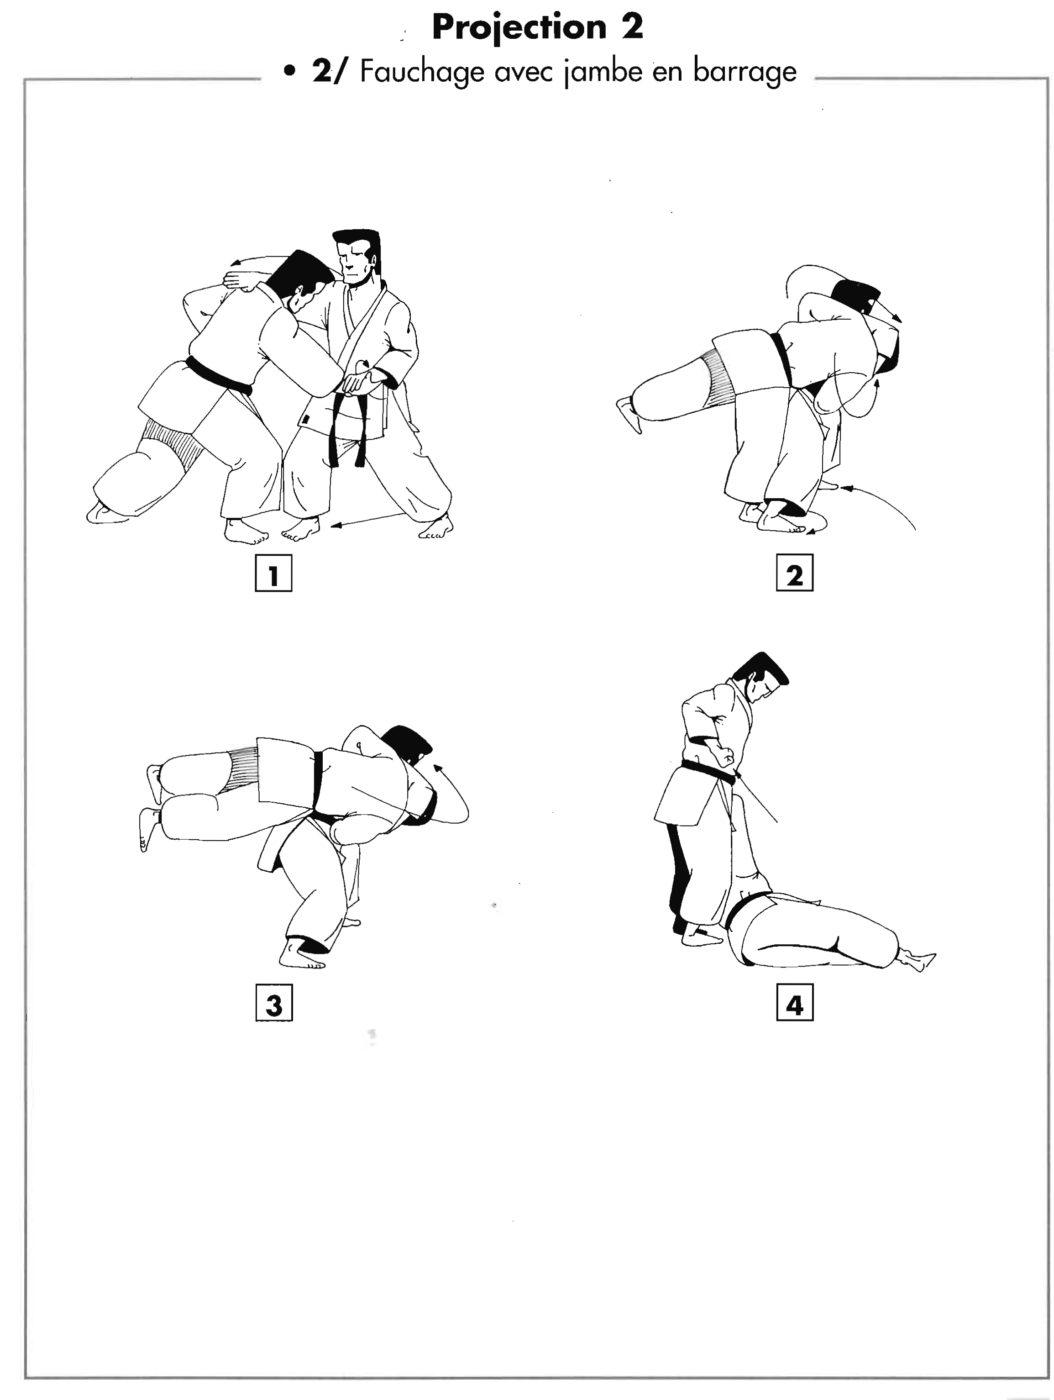 Projection : tai otoshi – renversement avec jambe en barrage